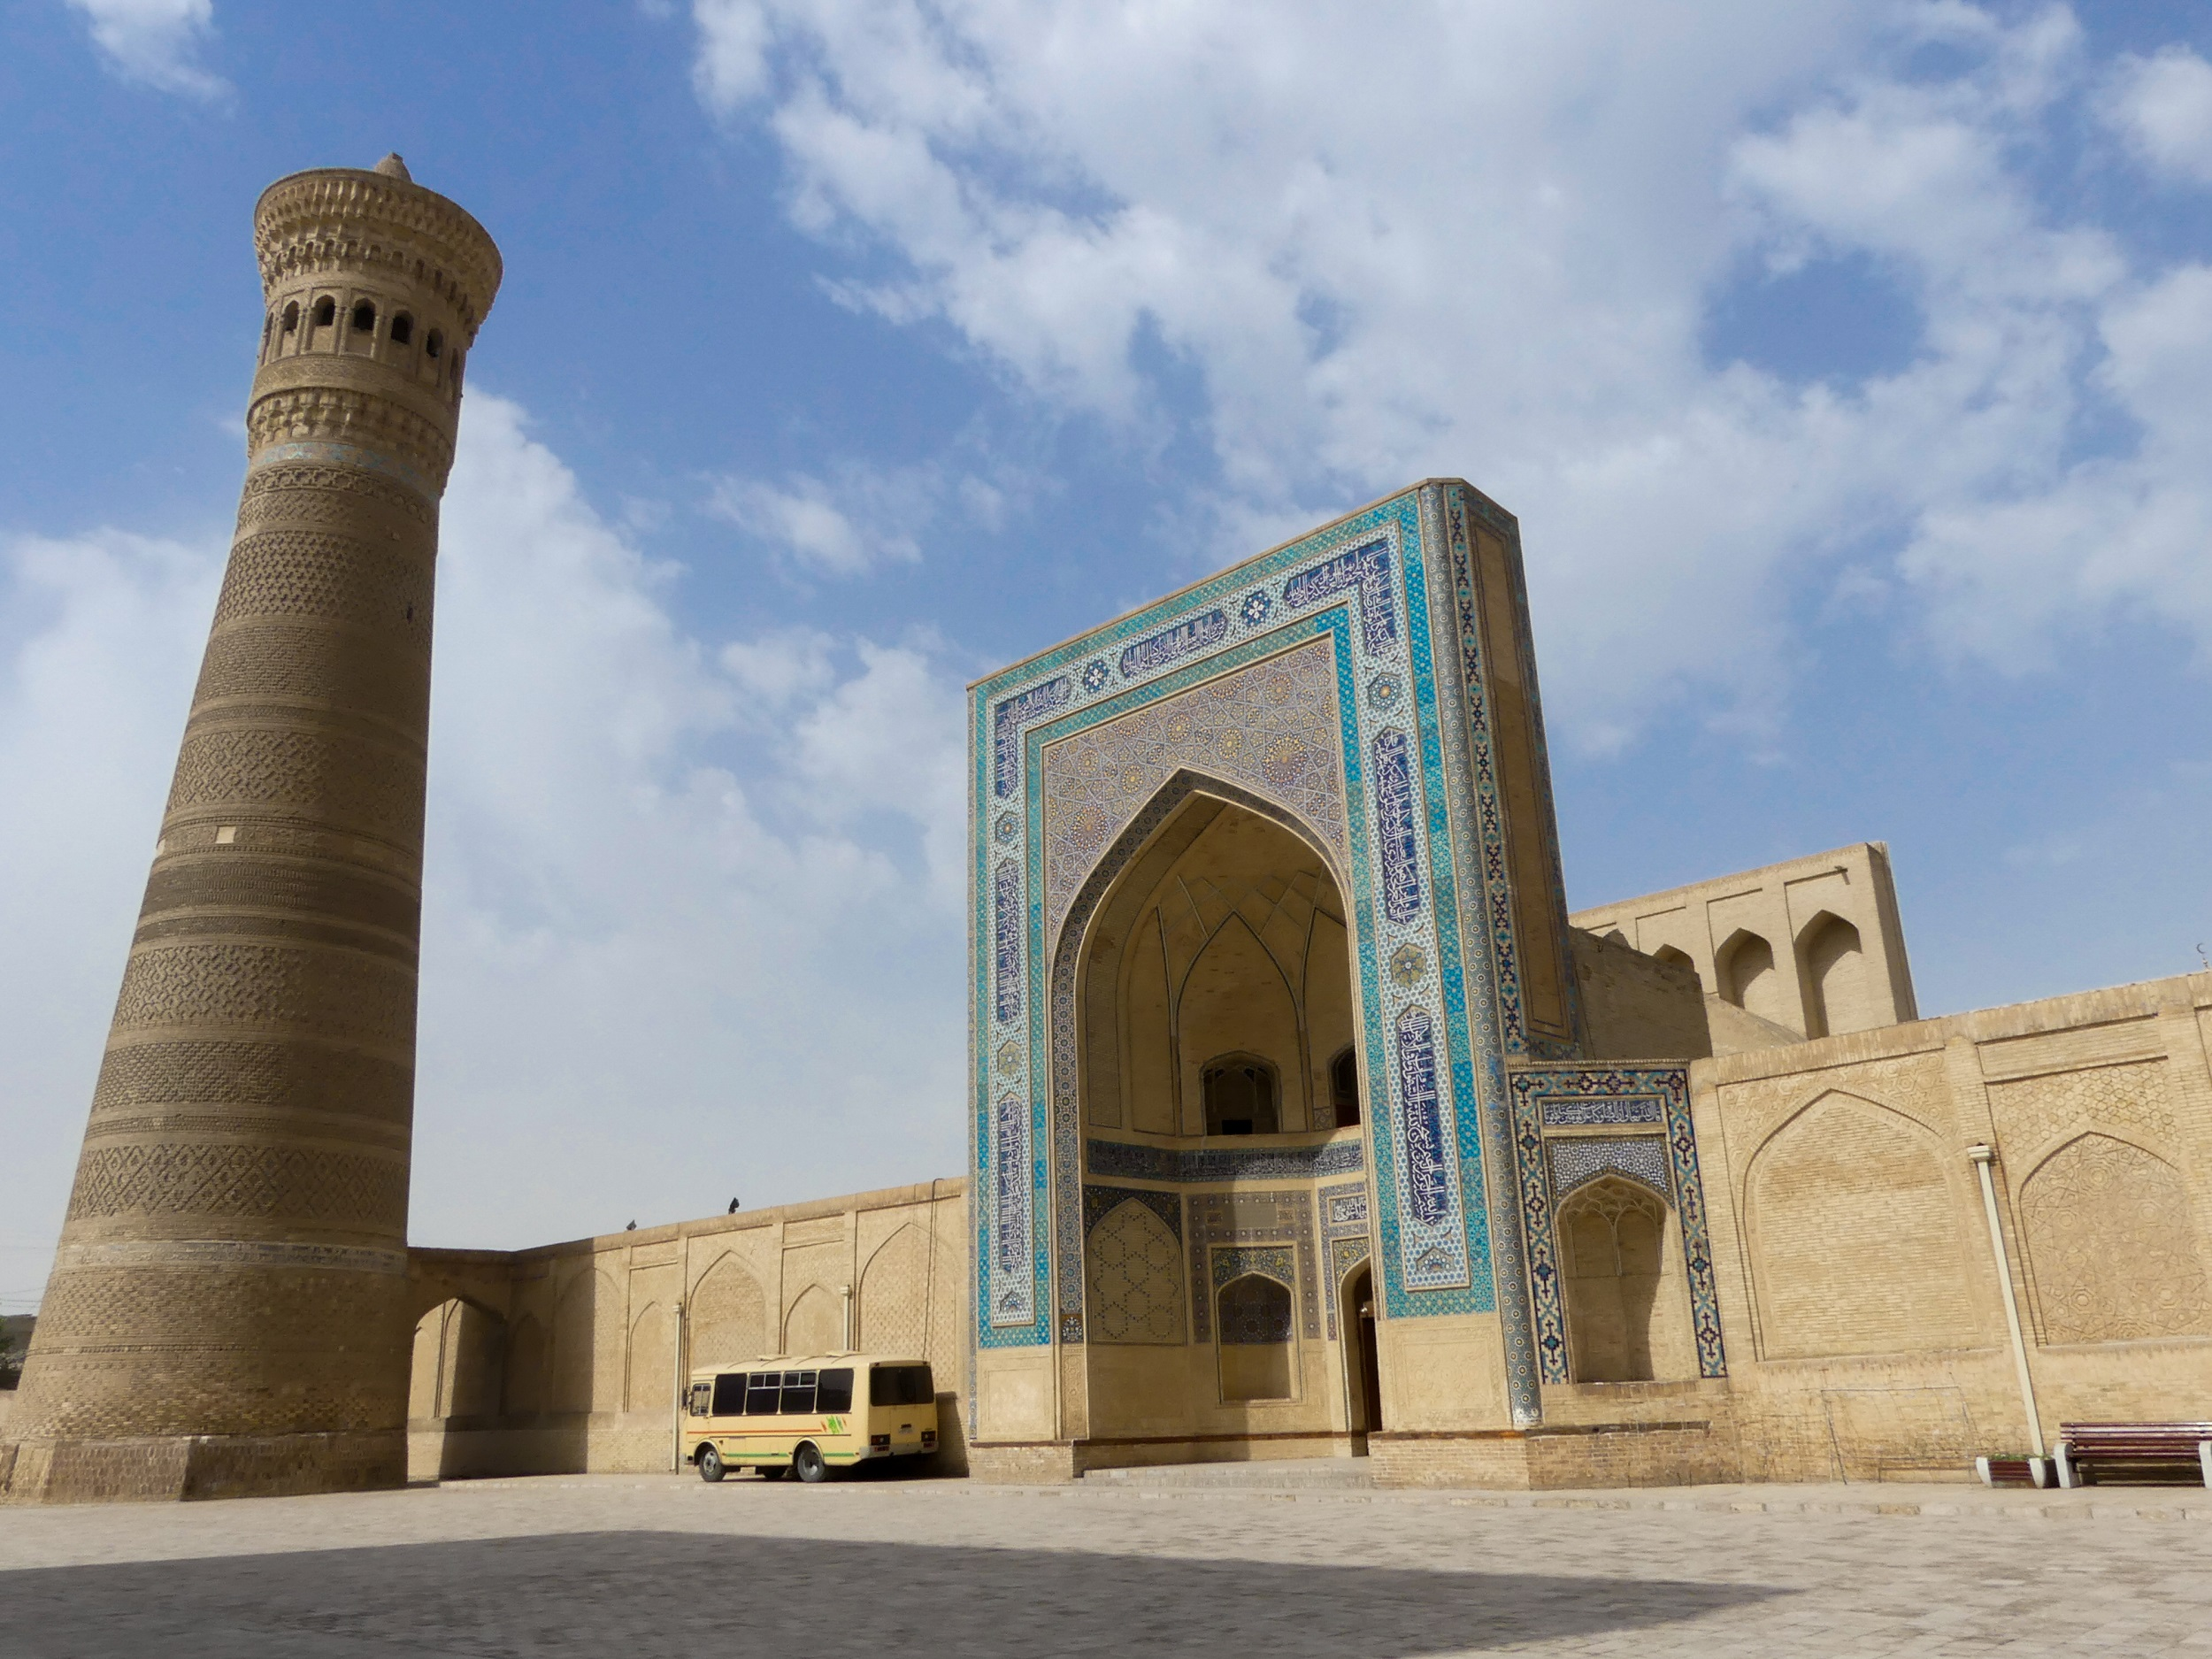 Kalyan minaret and mosque in Bukhara, Uzbekistan